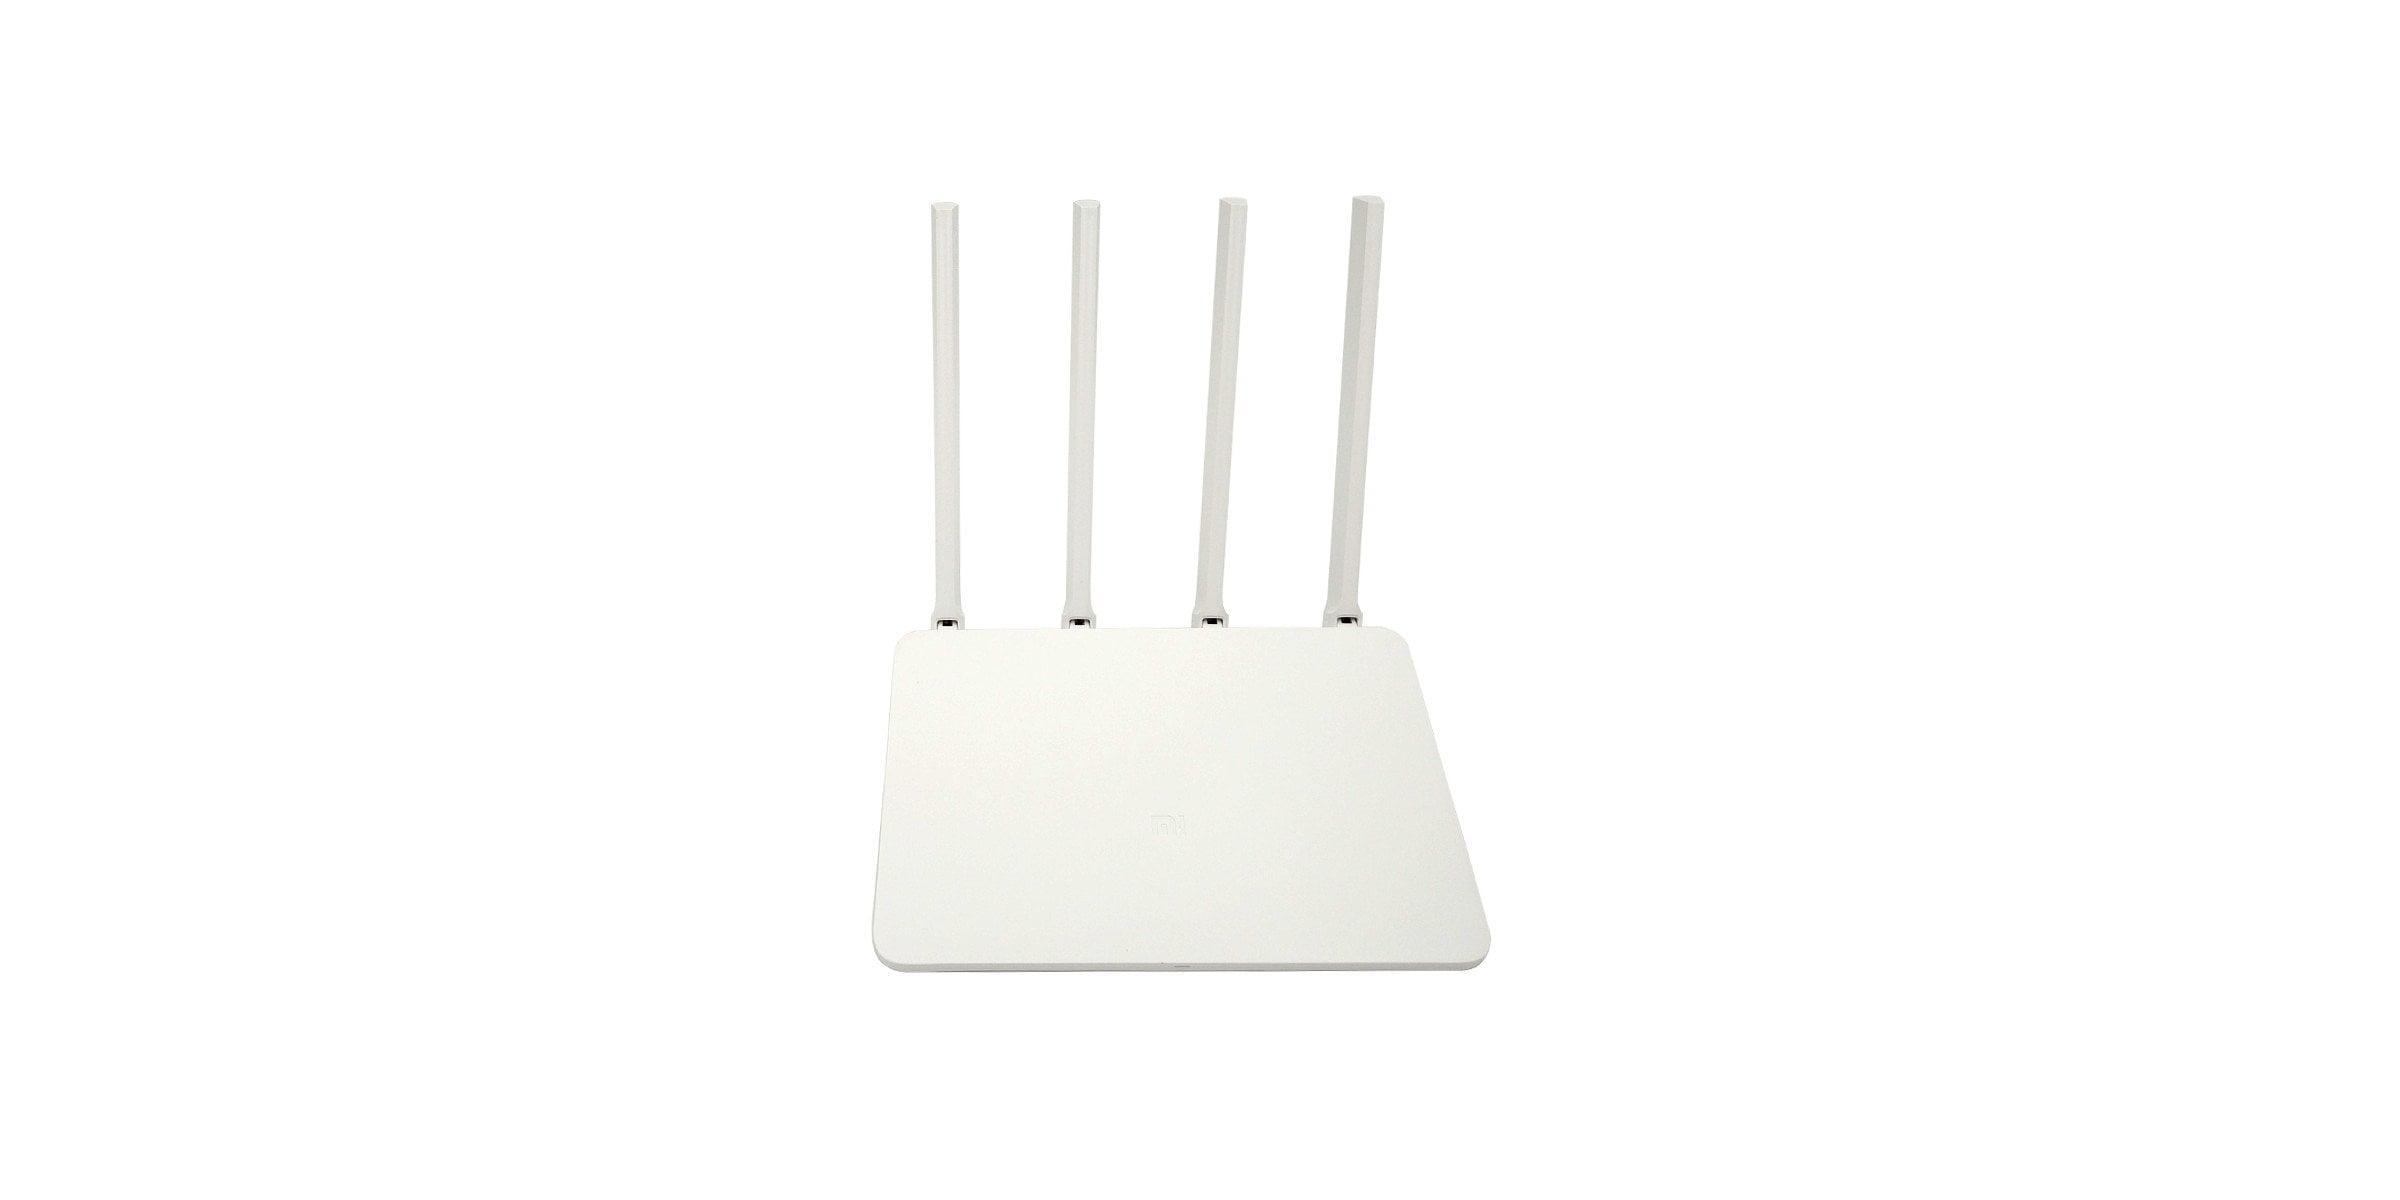 xiaomi-wifi-router-3g.jpg